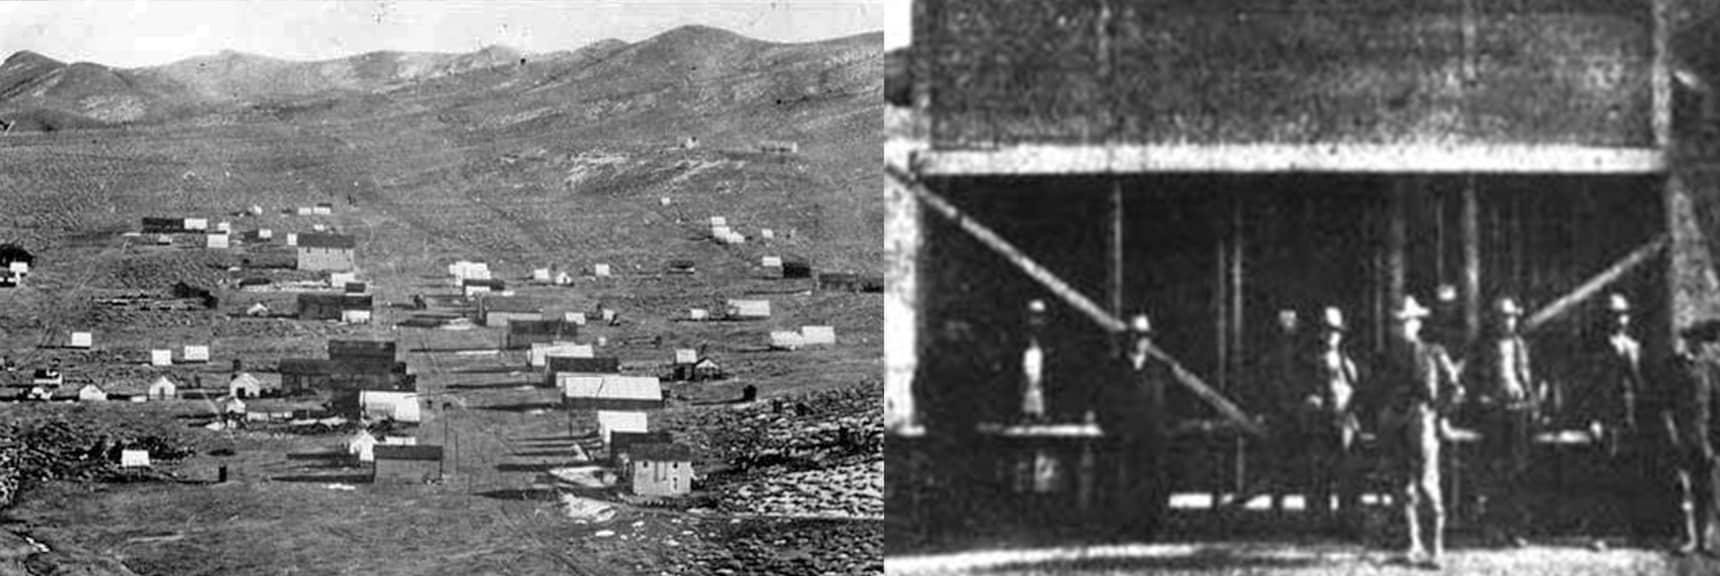 Town of Skidoo and Skidoo Club | Skidoo Mill | Death Valley, California